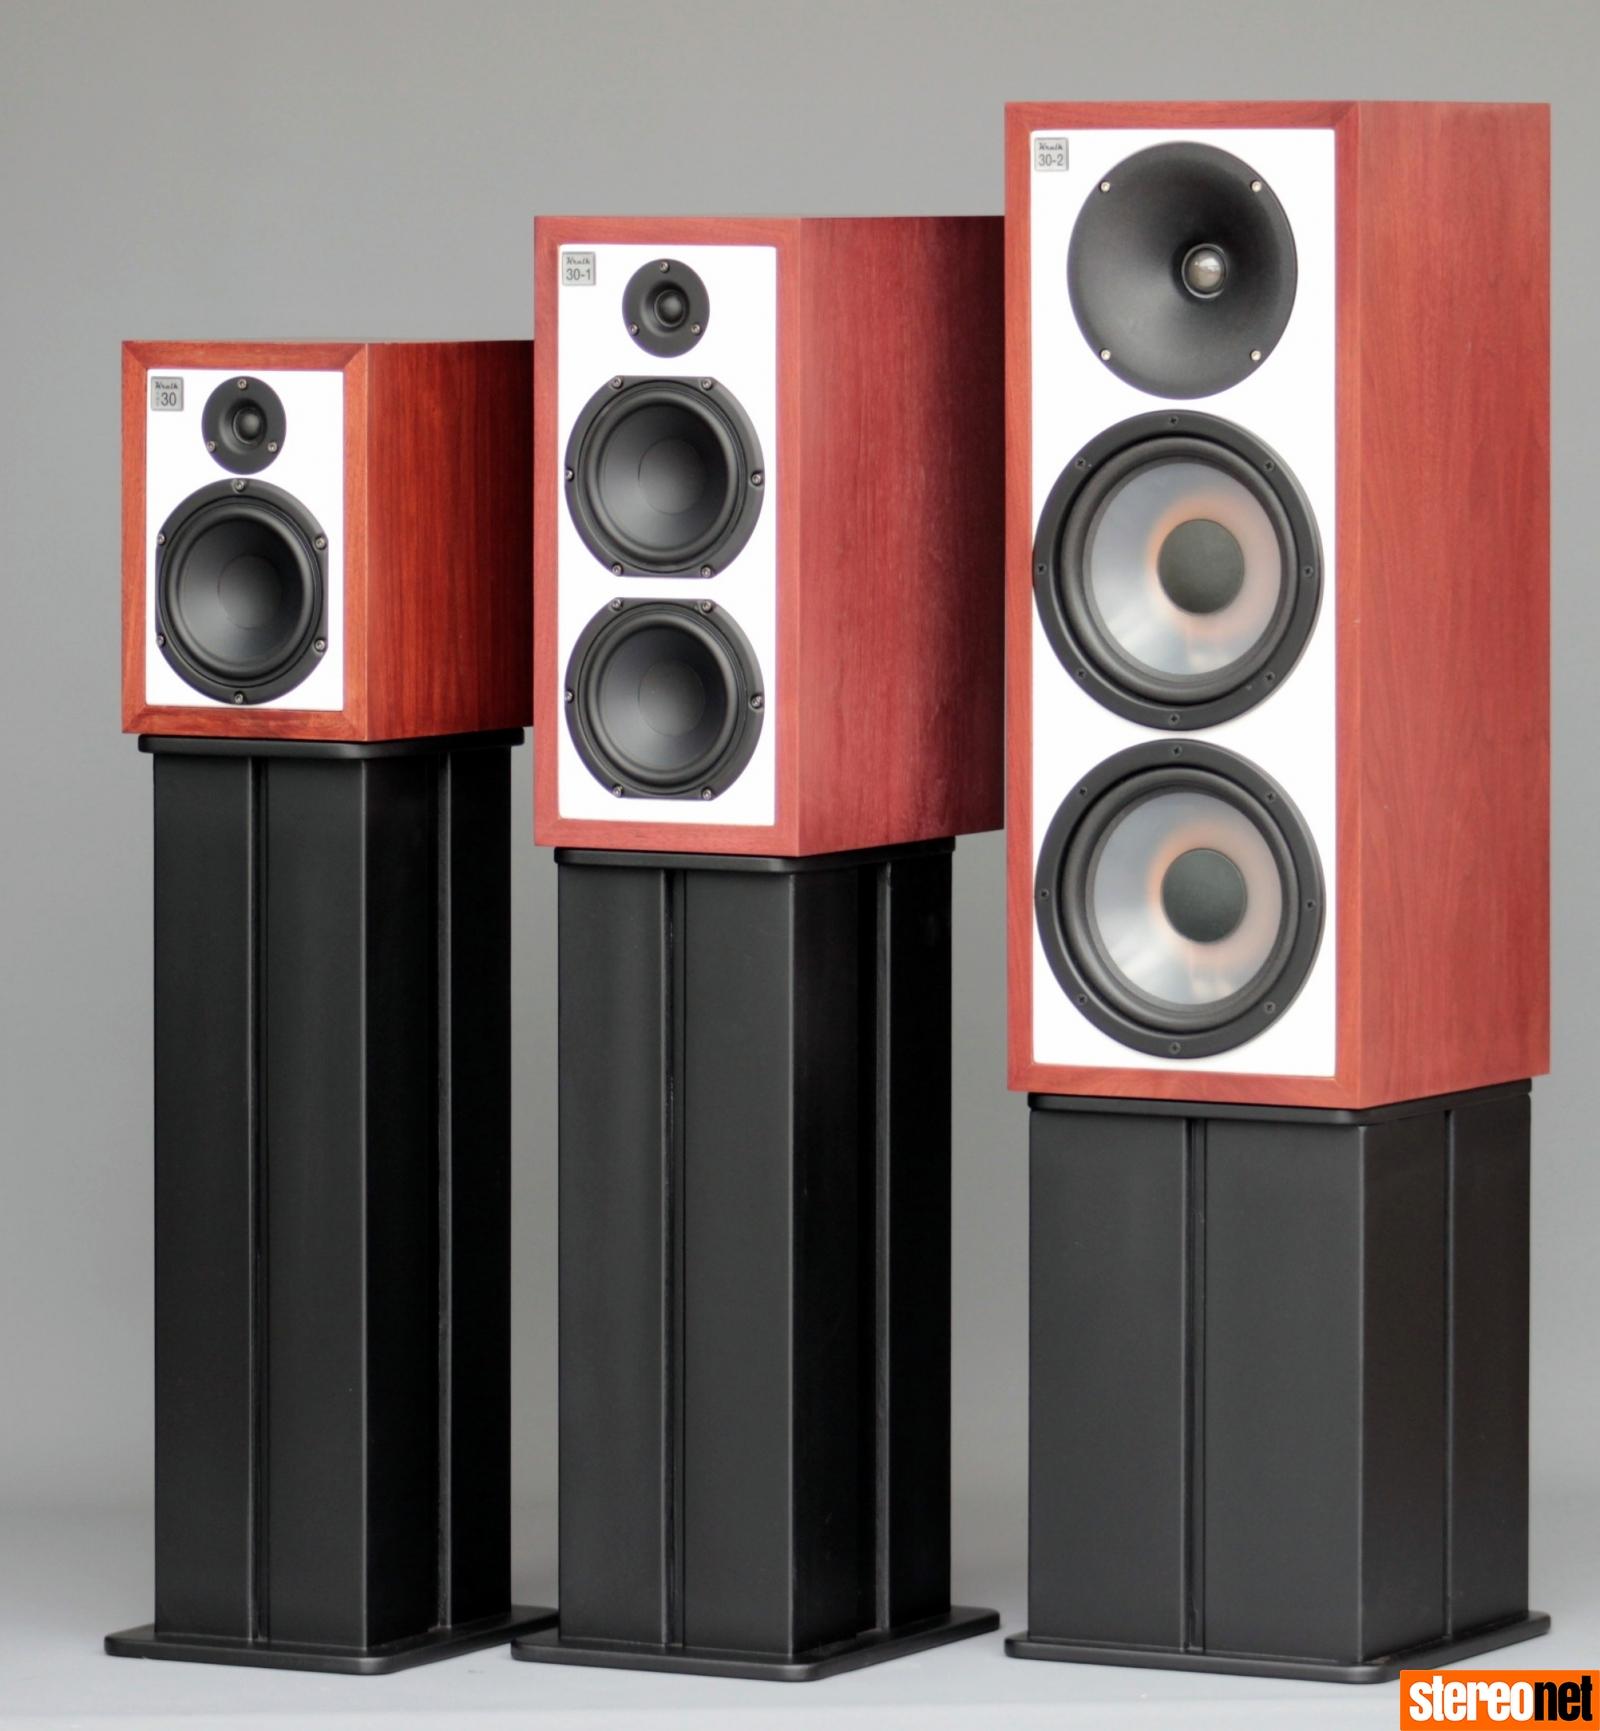 Kralk Audio Ltd